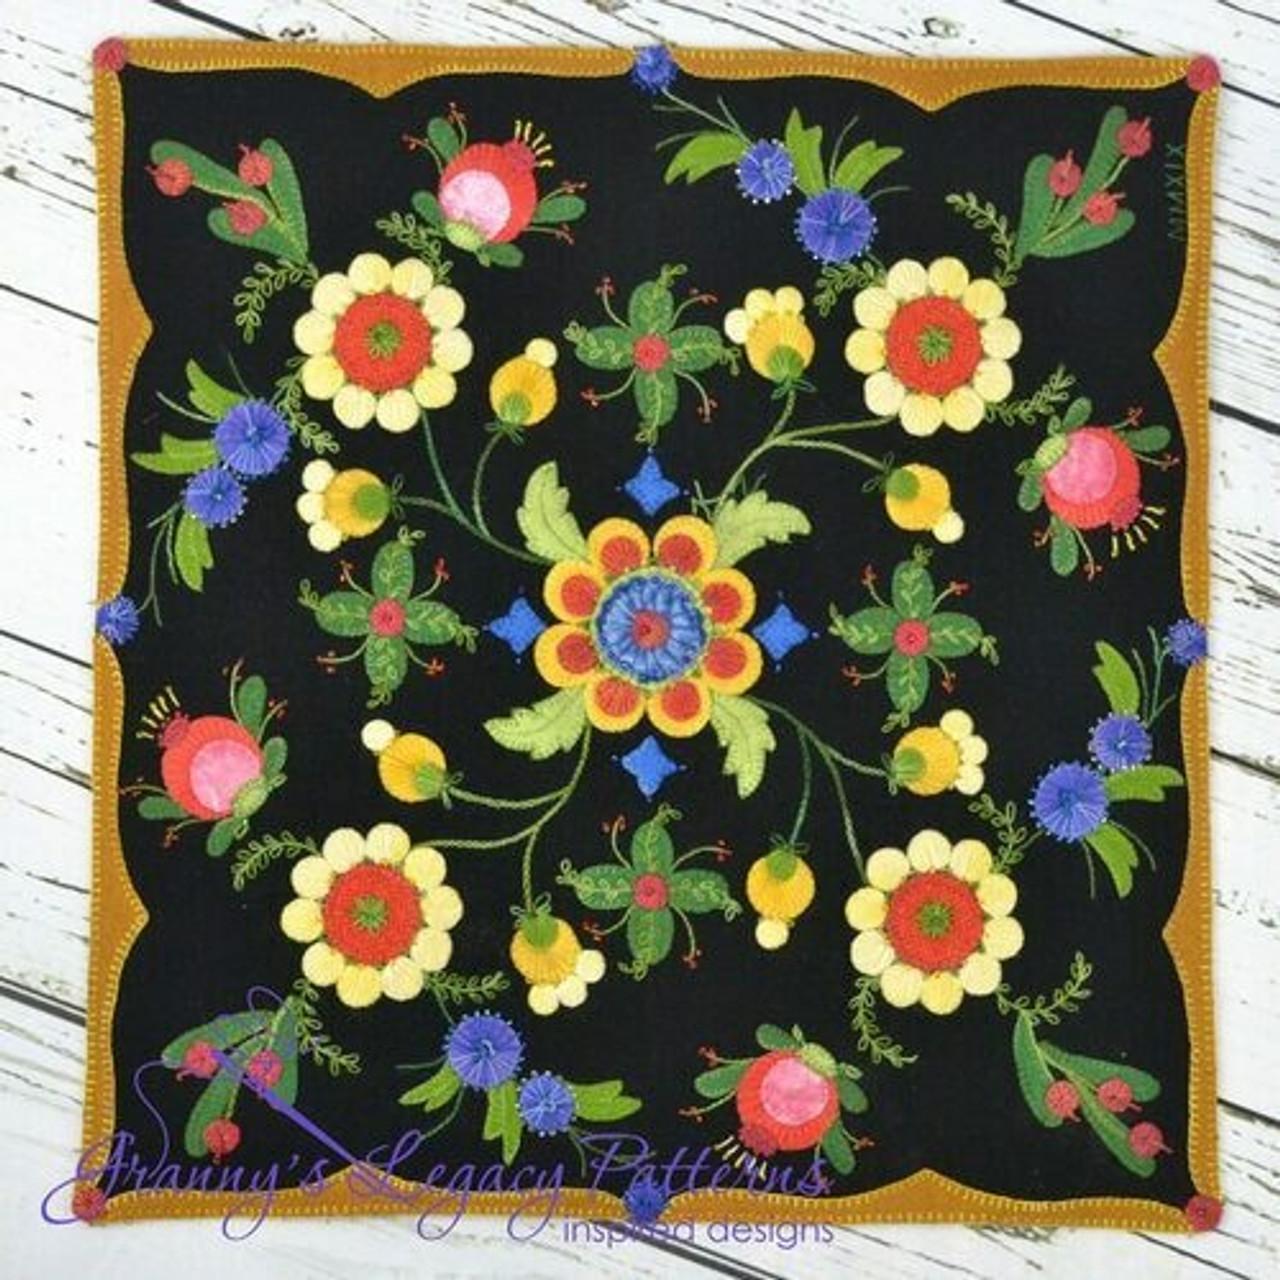 Granny's Legacy : Rosemary's Garden Kit